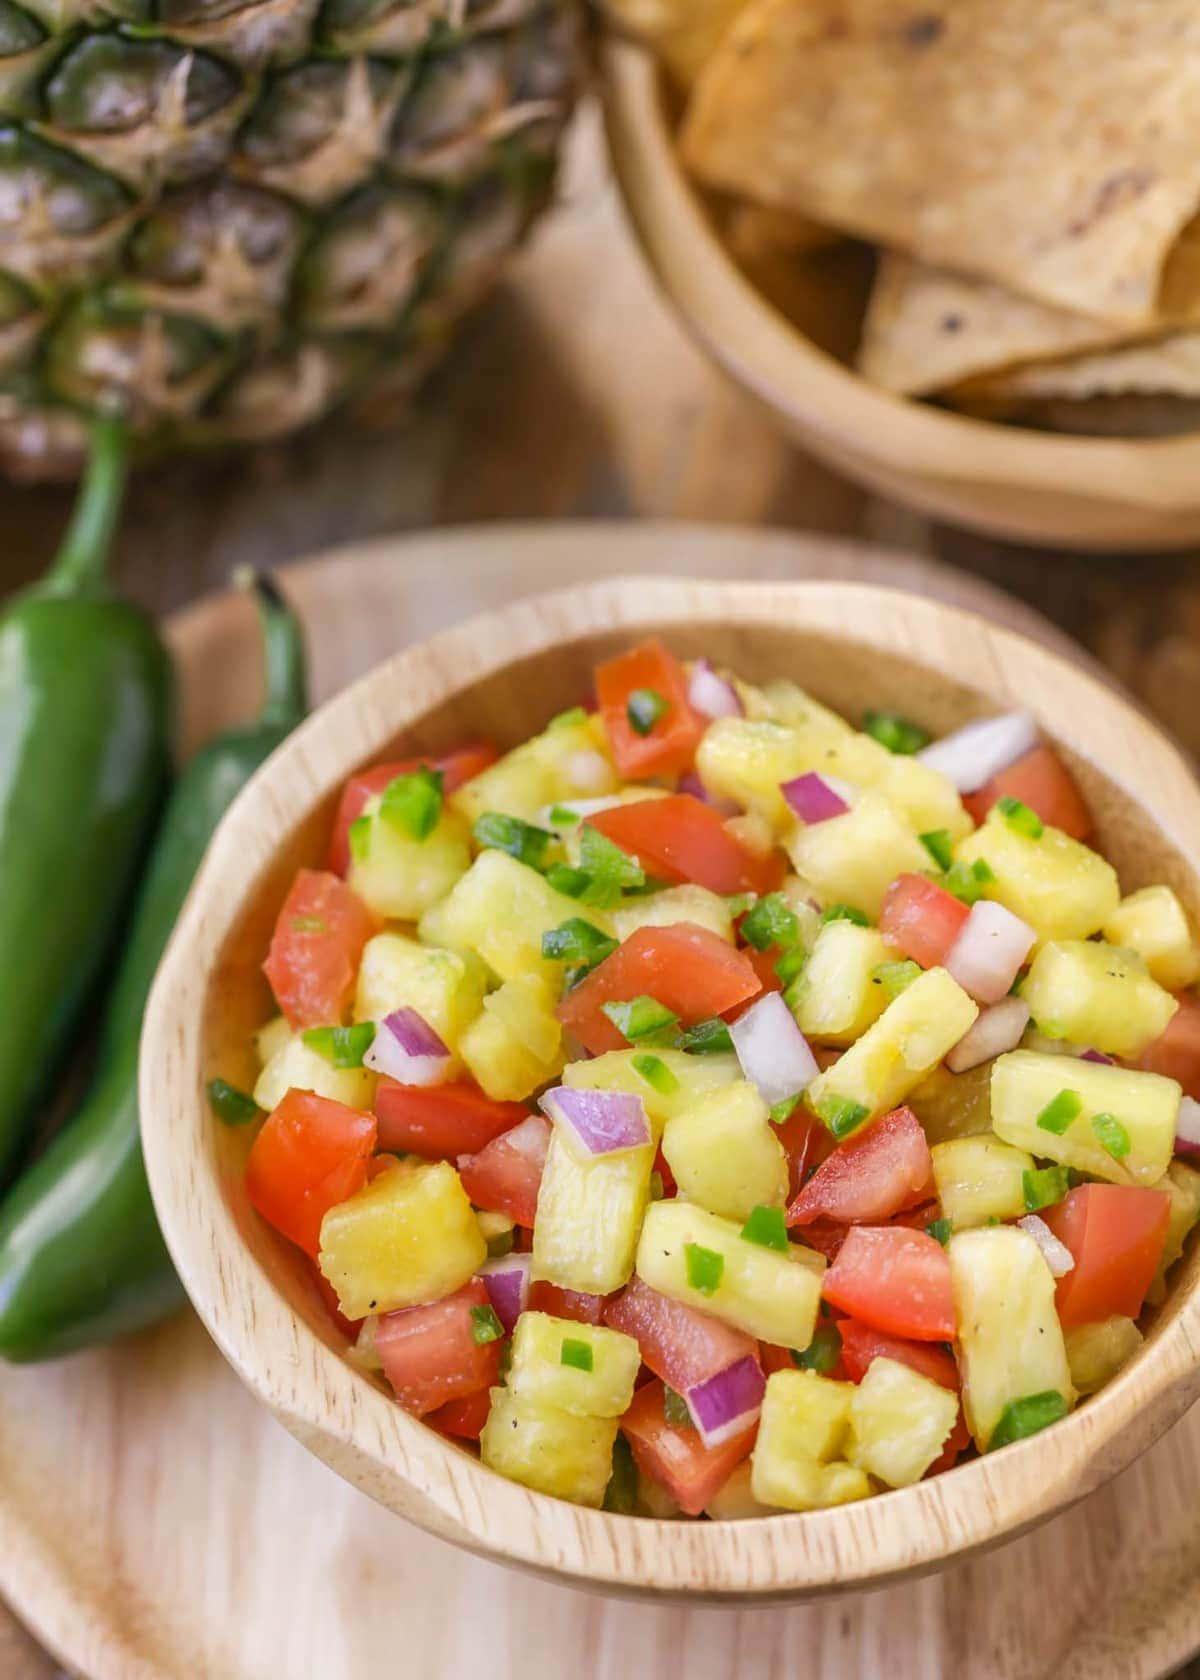 Pineapple jalapeno salsa in bowl